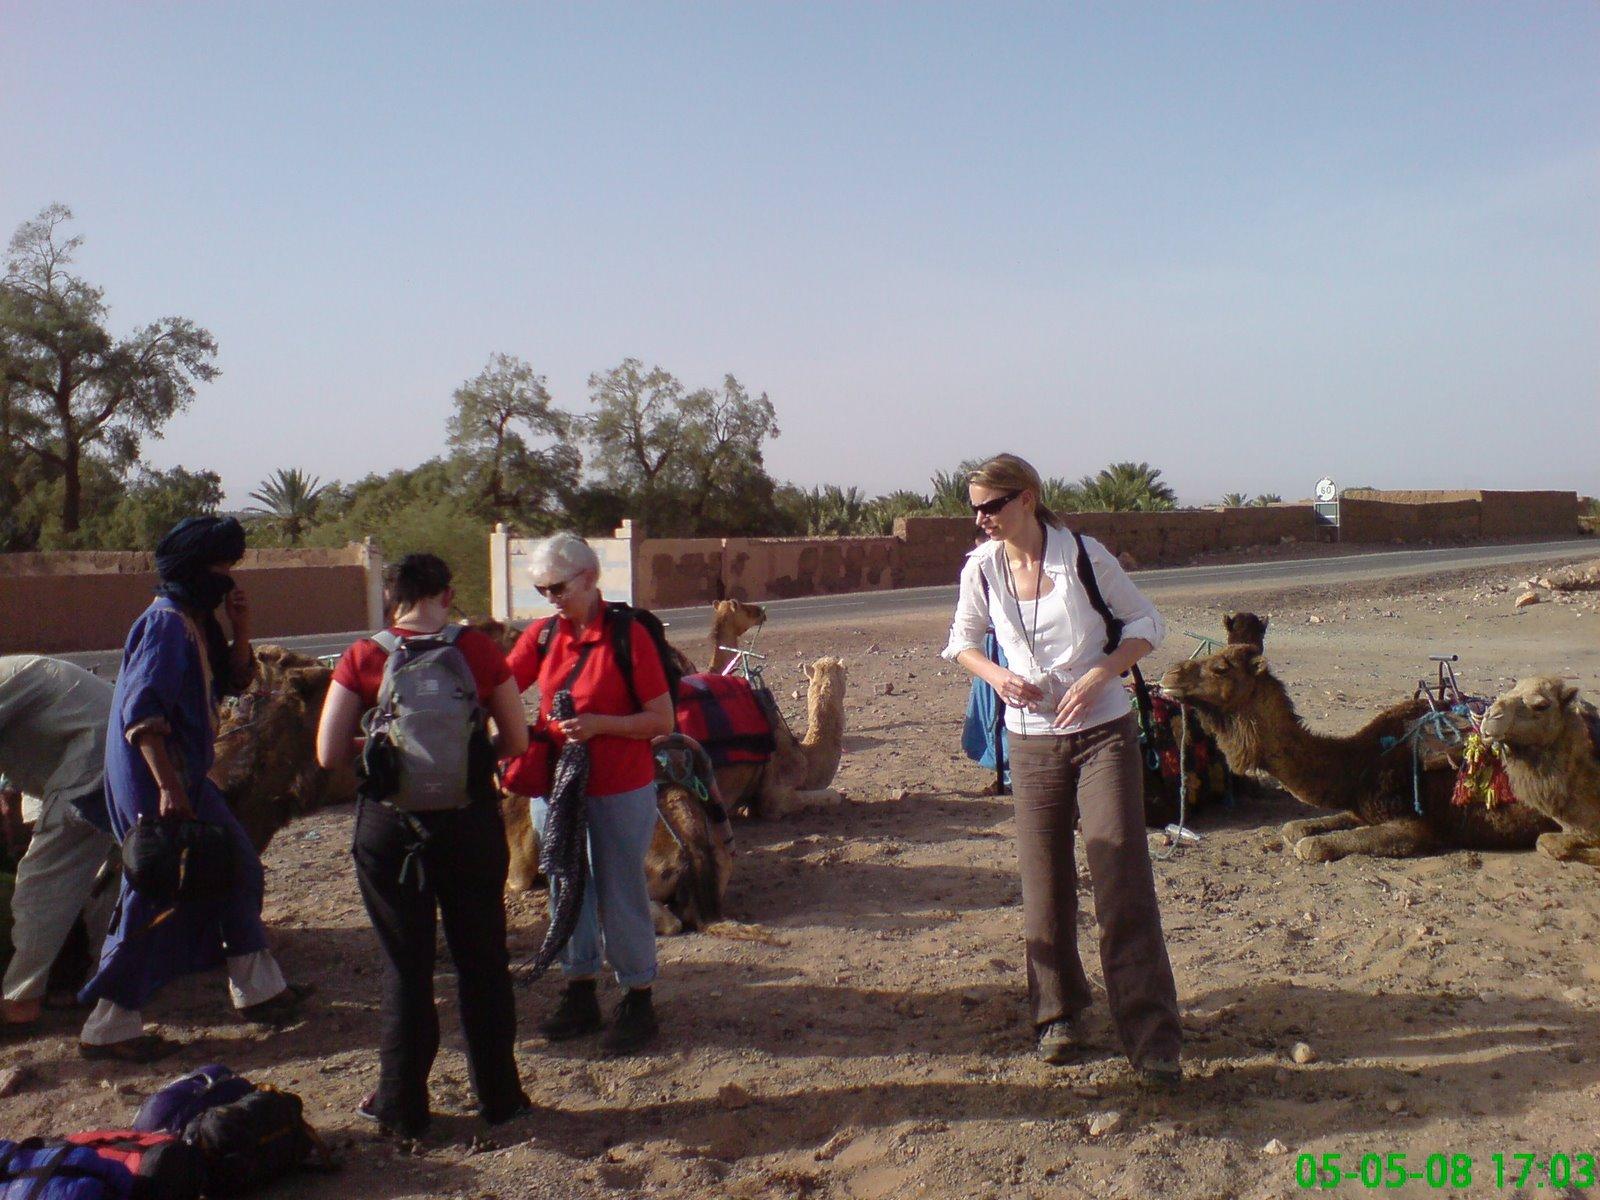 Start of 'camel' trek to the edge of the sahara at Zagora